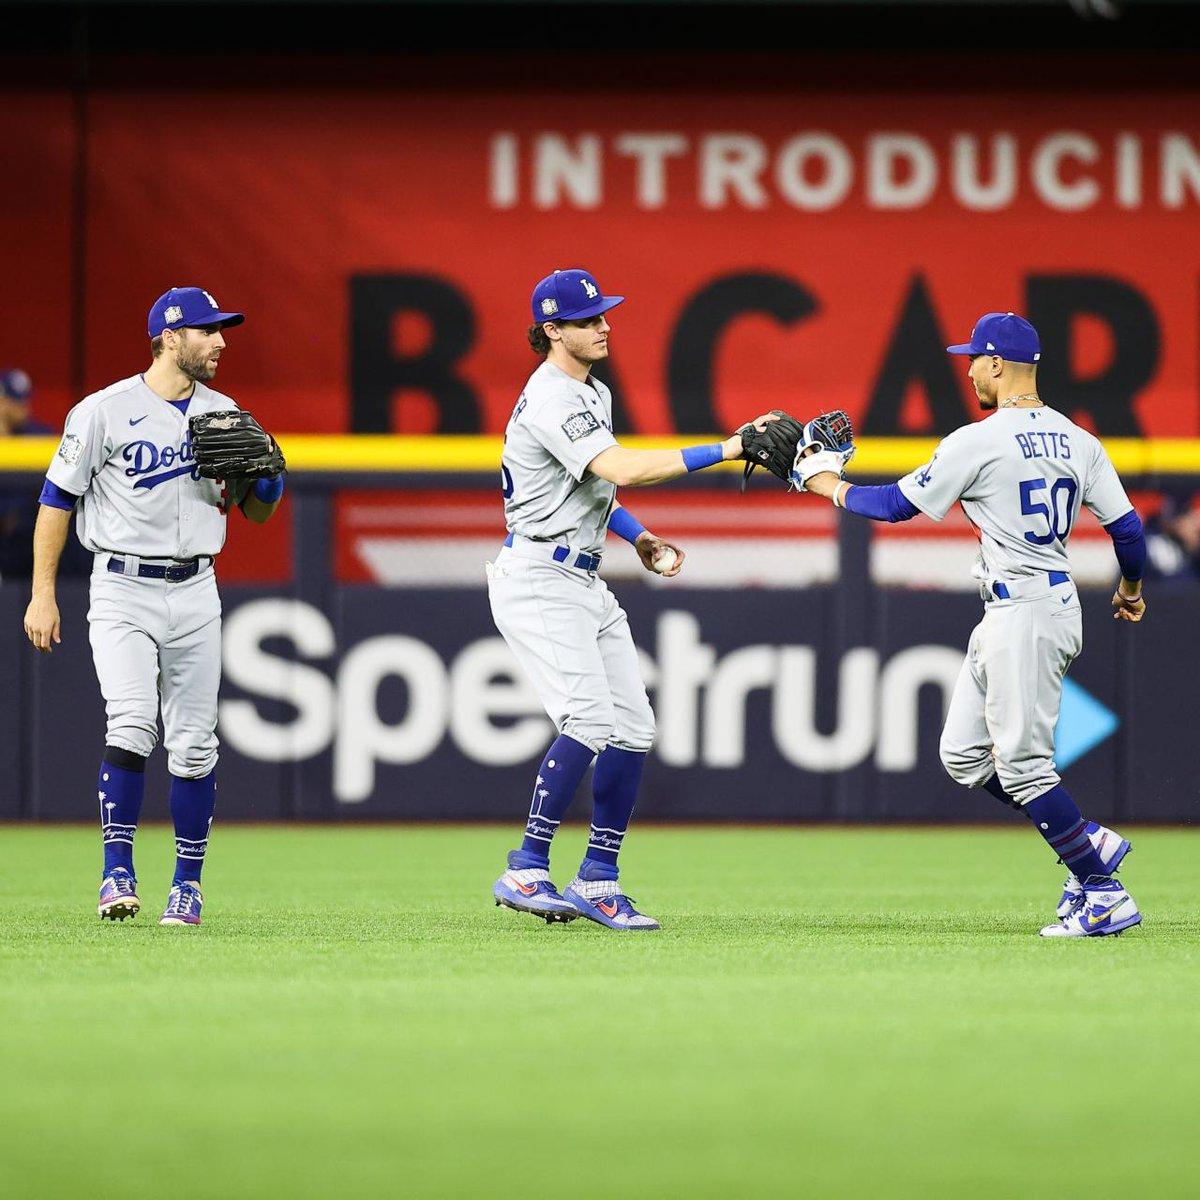 @HablaDeportes's photo on Yankees